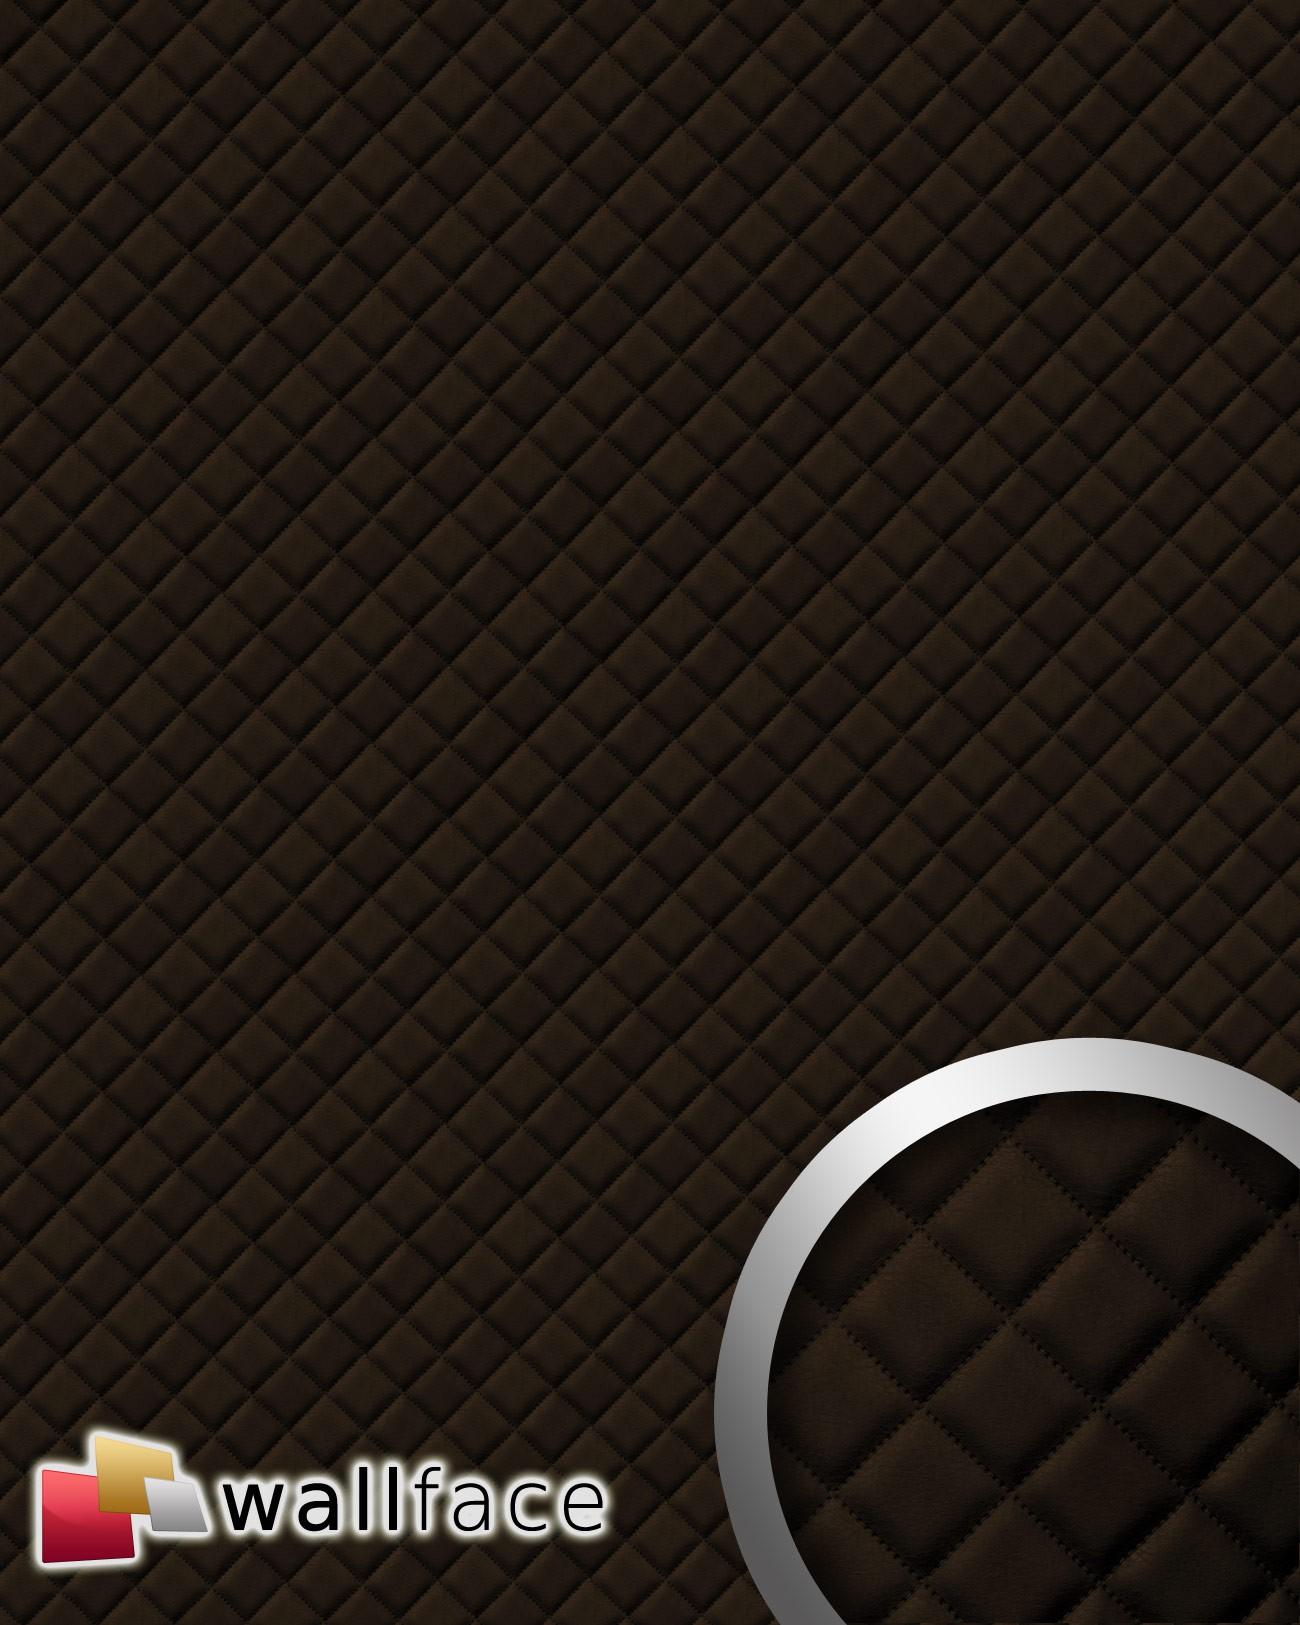 Panou Decorativ Leather 15036  Wallface  Autocolan